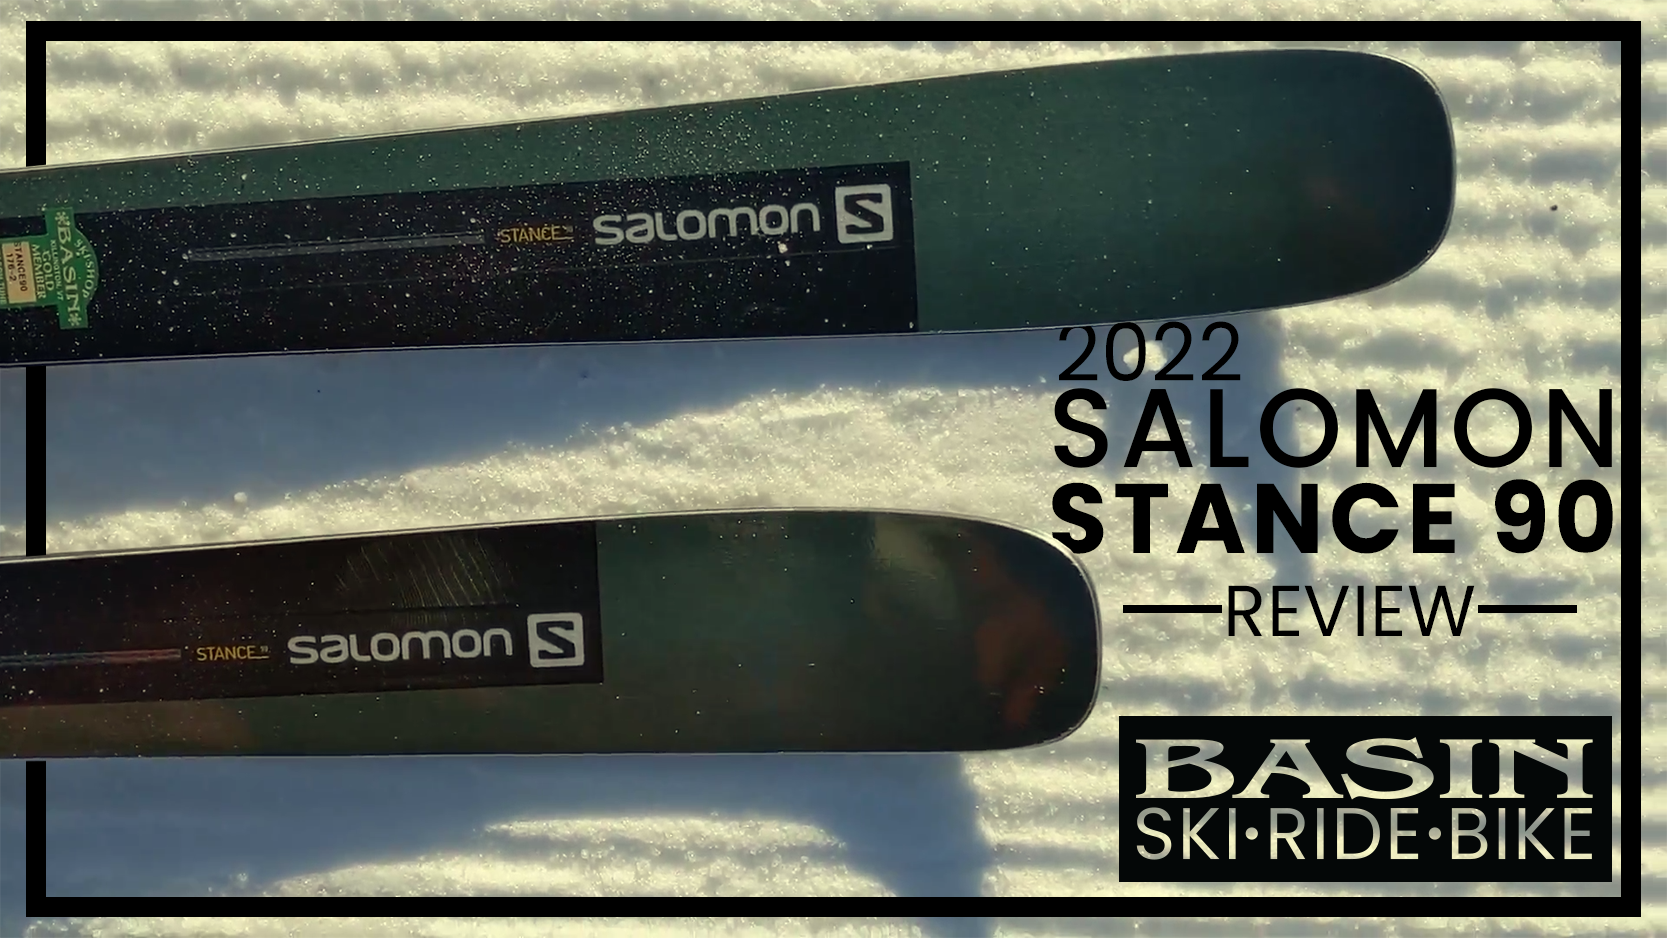 2022 Salomon Stance 90 - Basin Review